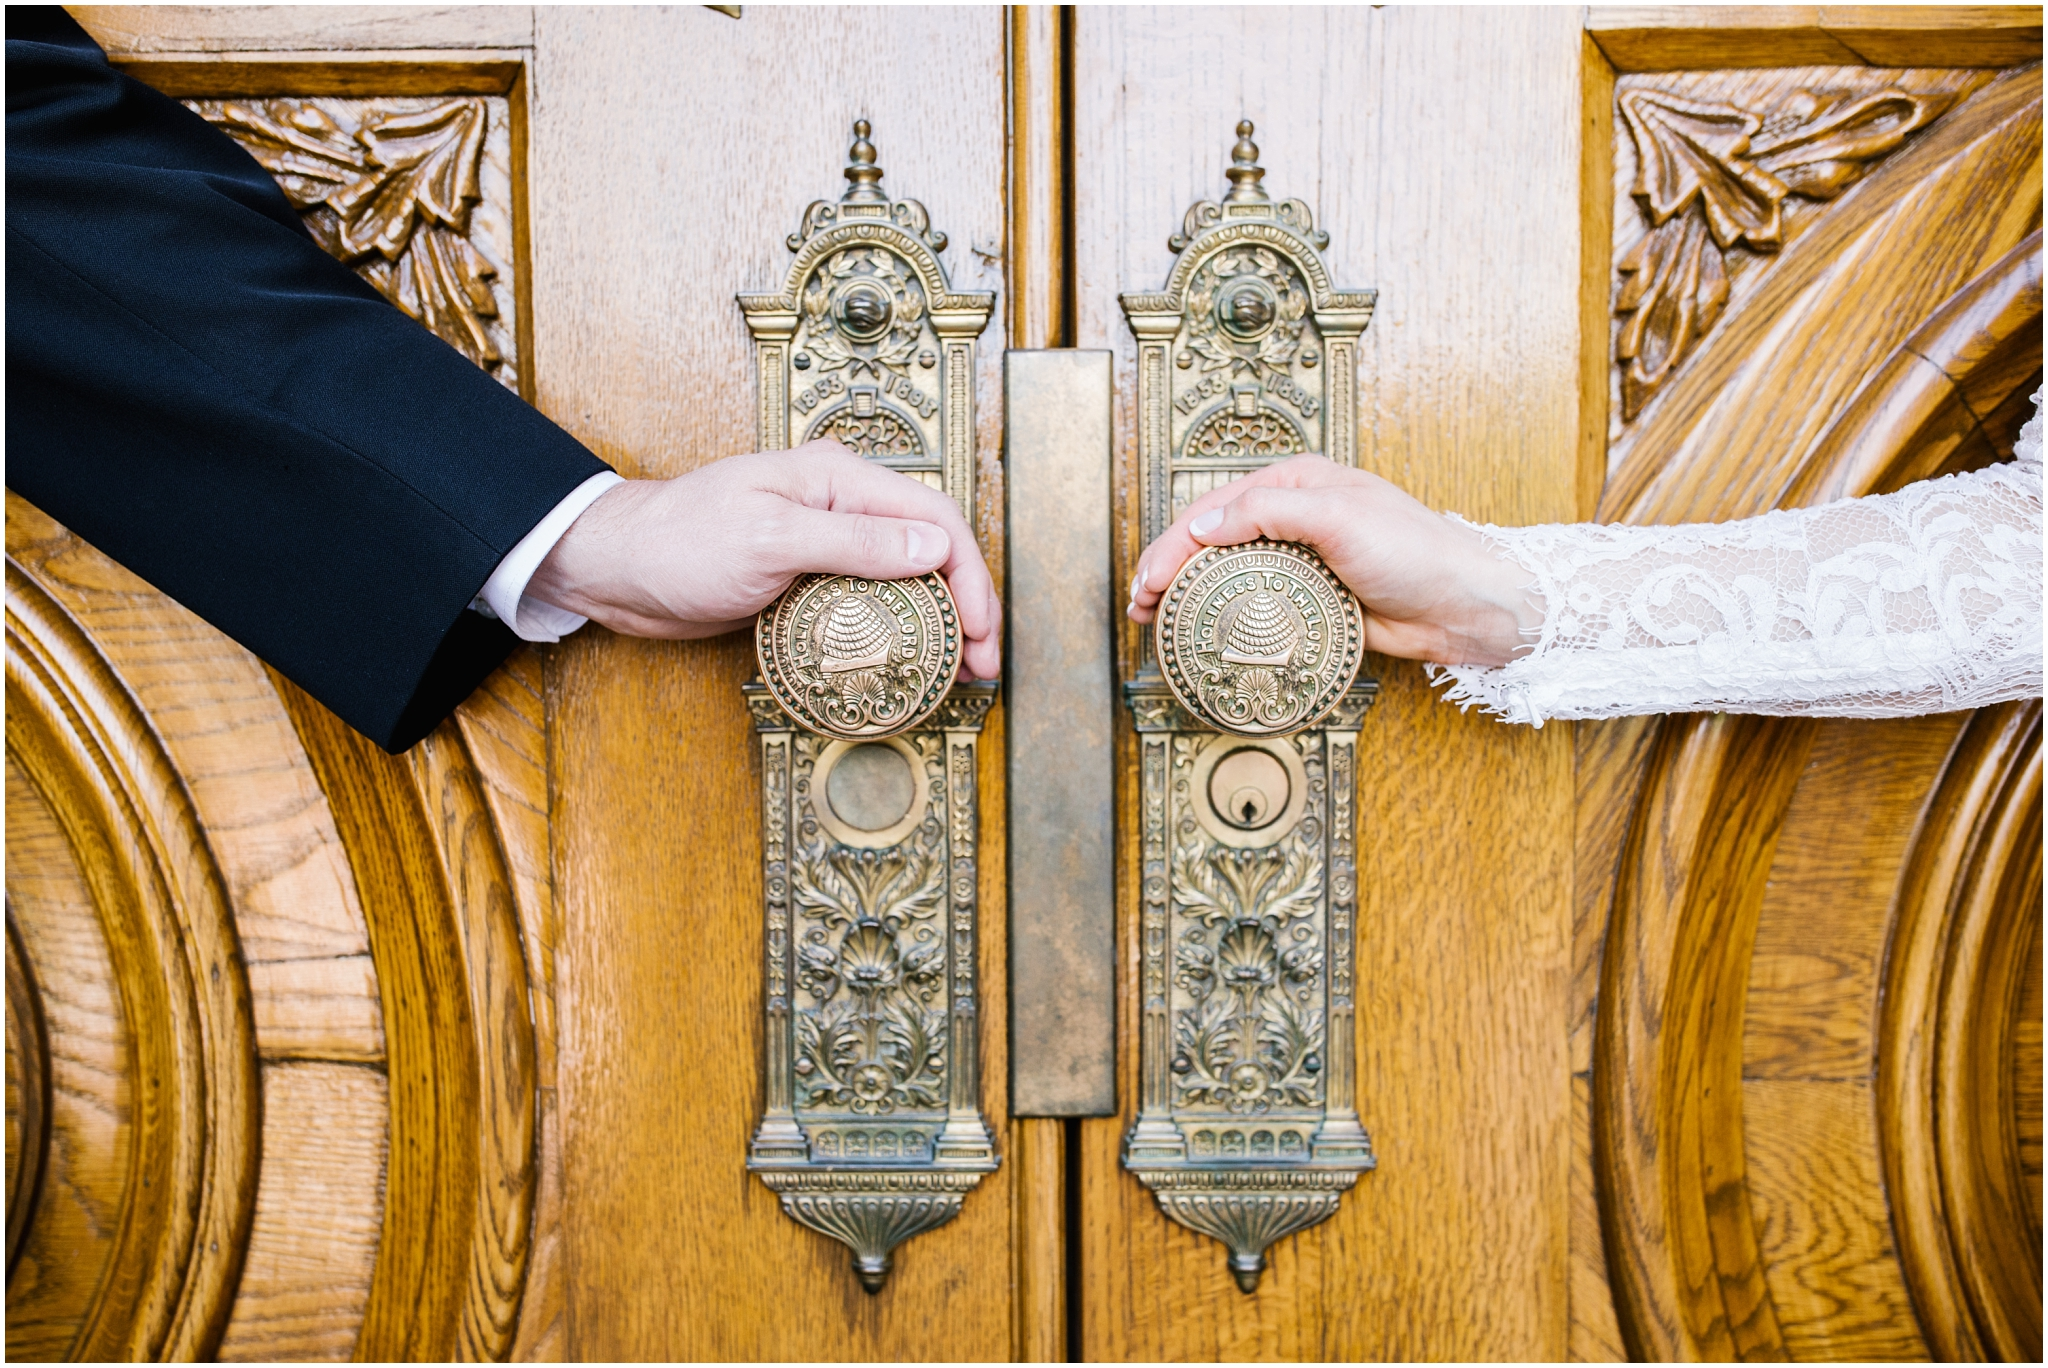 CherylandTyler-143_Lizzie-B-Imagery-Utah-Wedding-Photographer-Salt-Lake-City-Temple-Wells-Fargo-Building-Reception.jpg